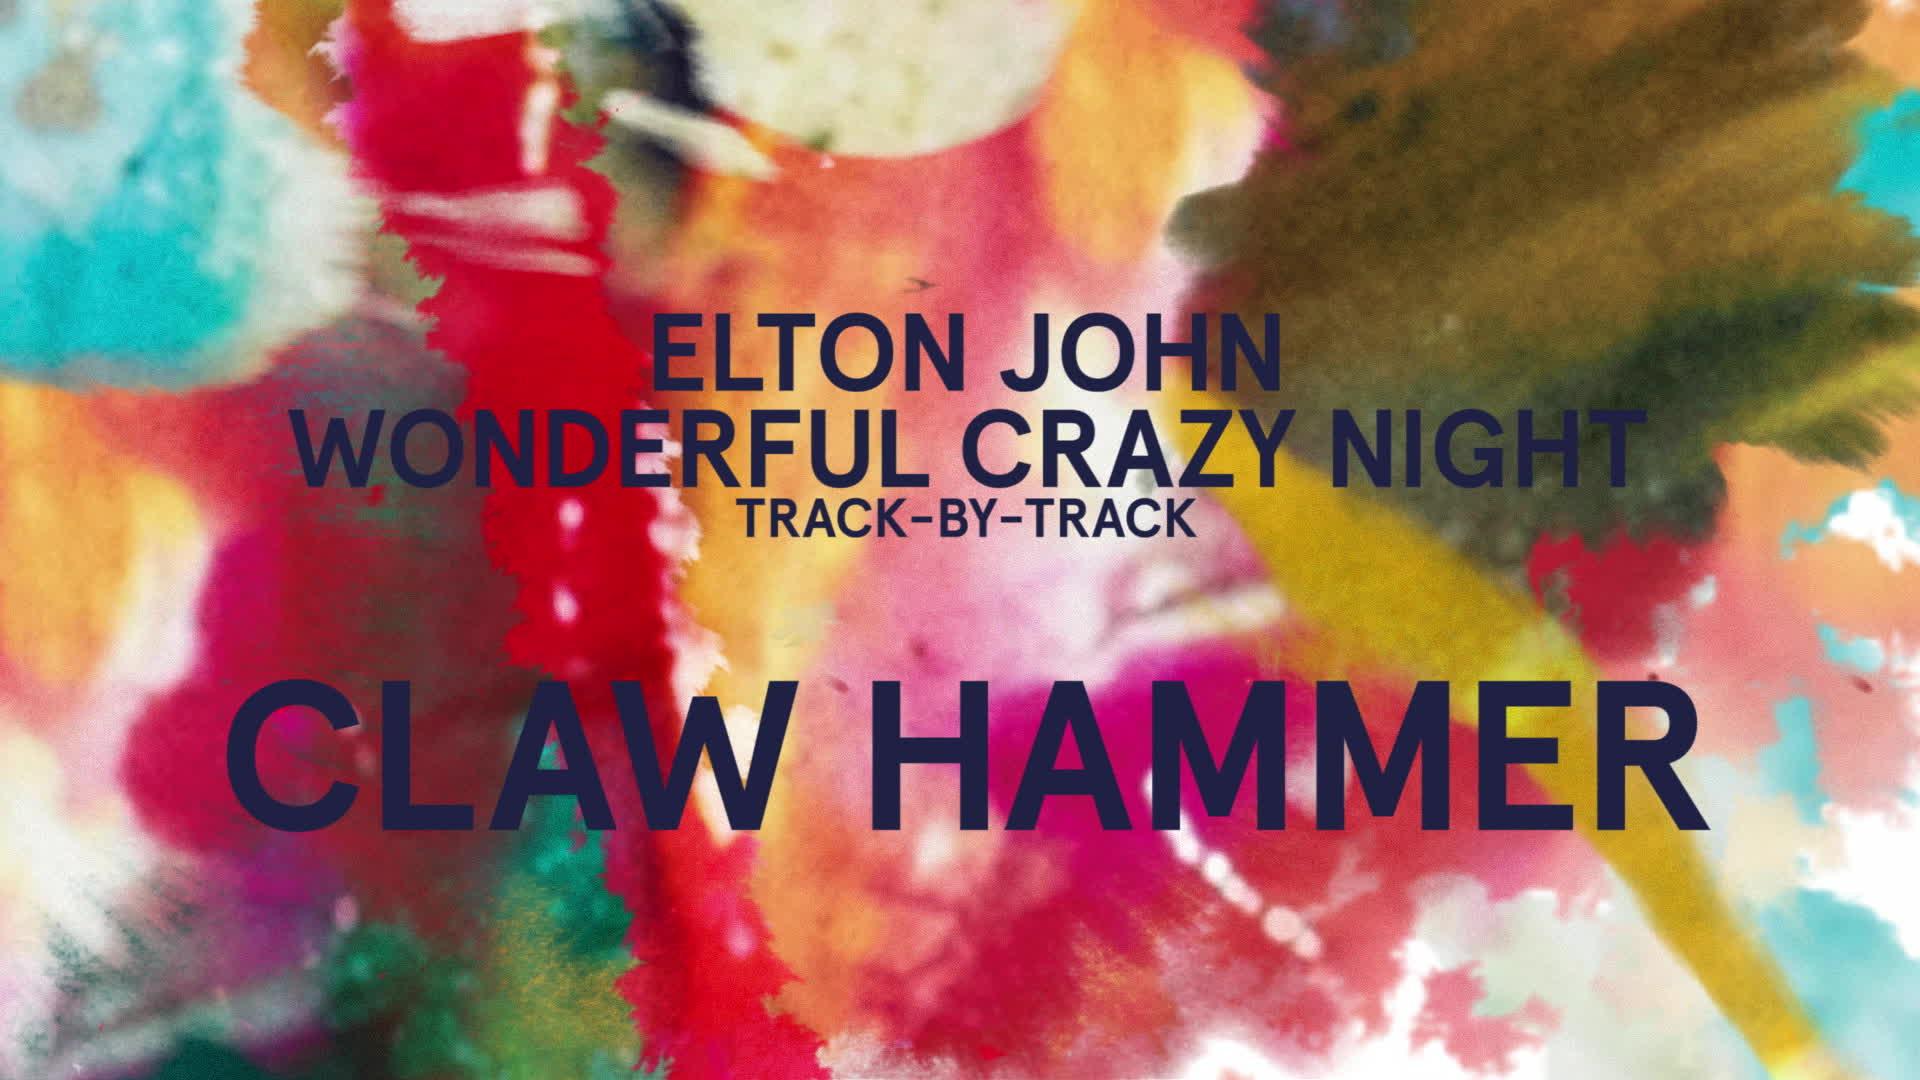 Elton John, Claw Hammer (Songbesprechung)